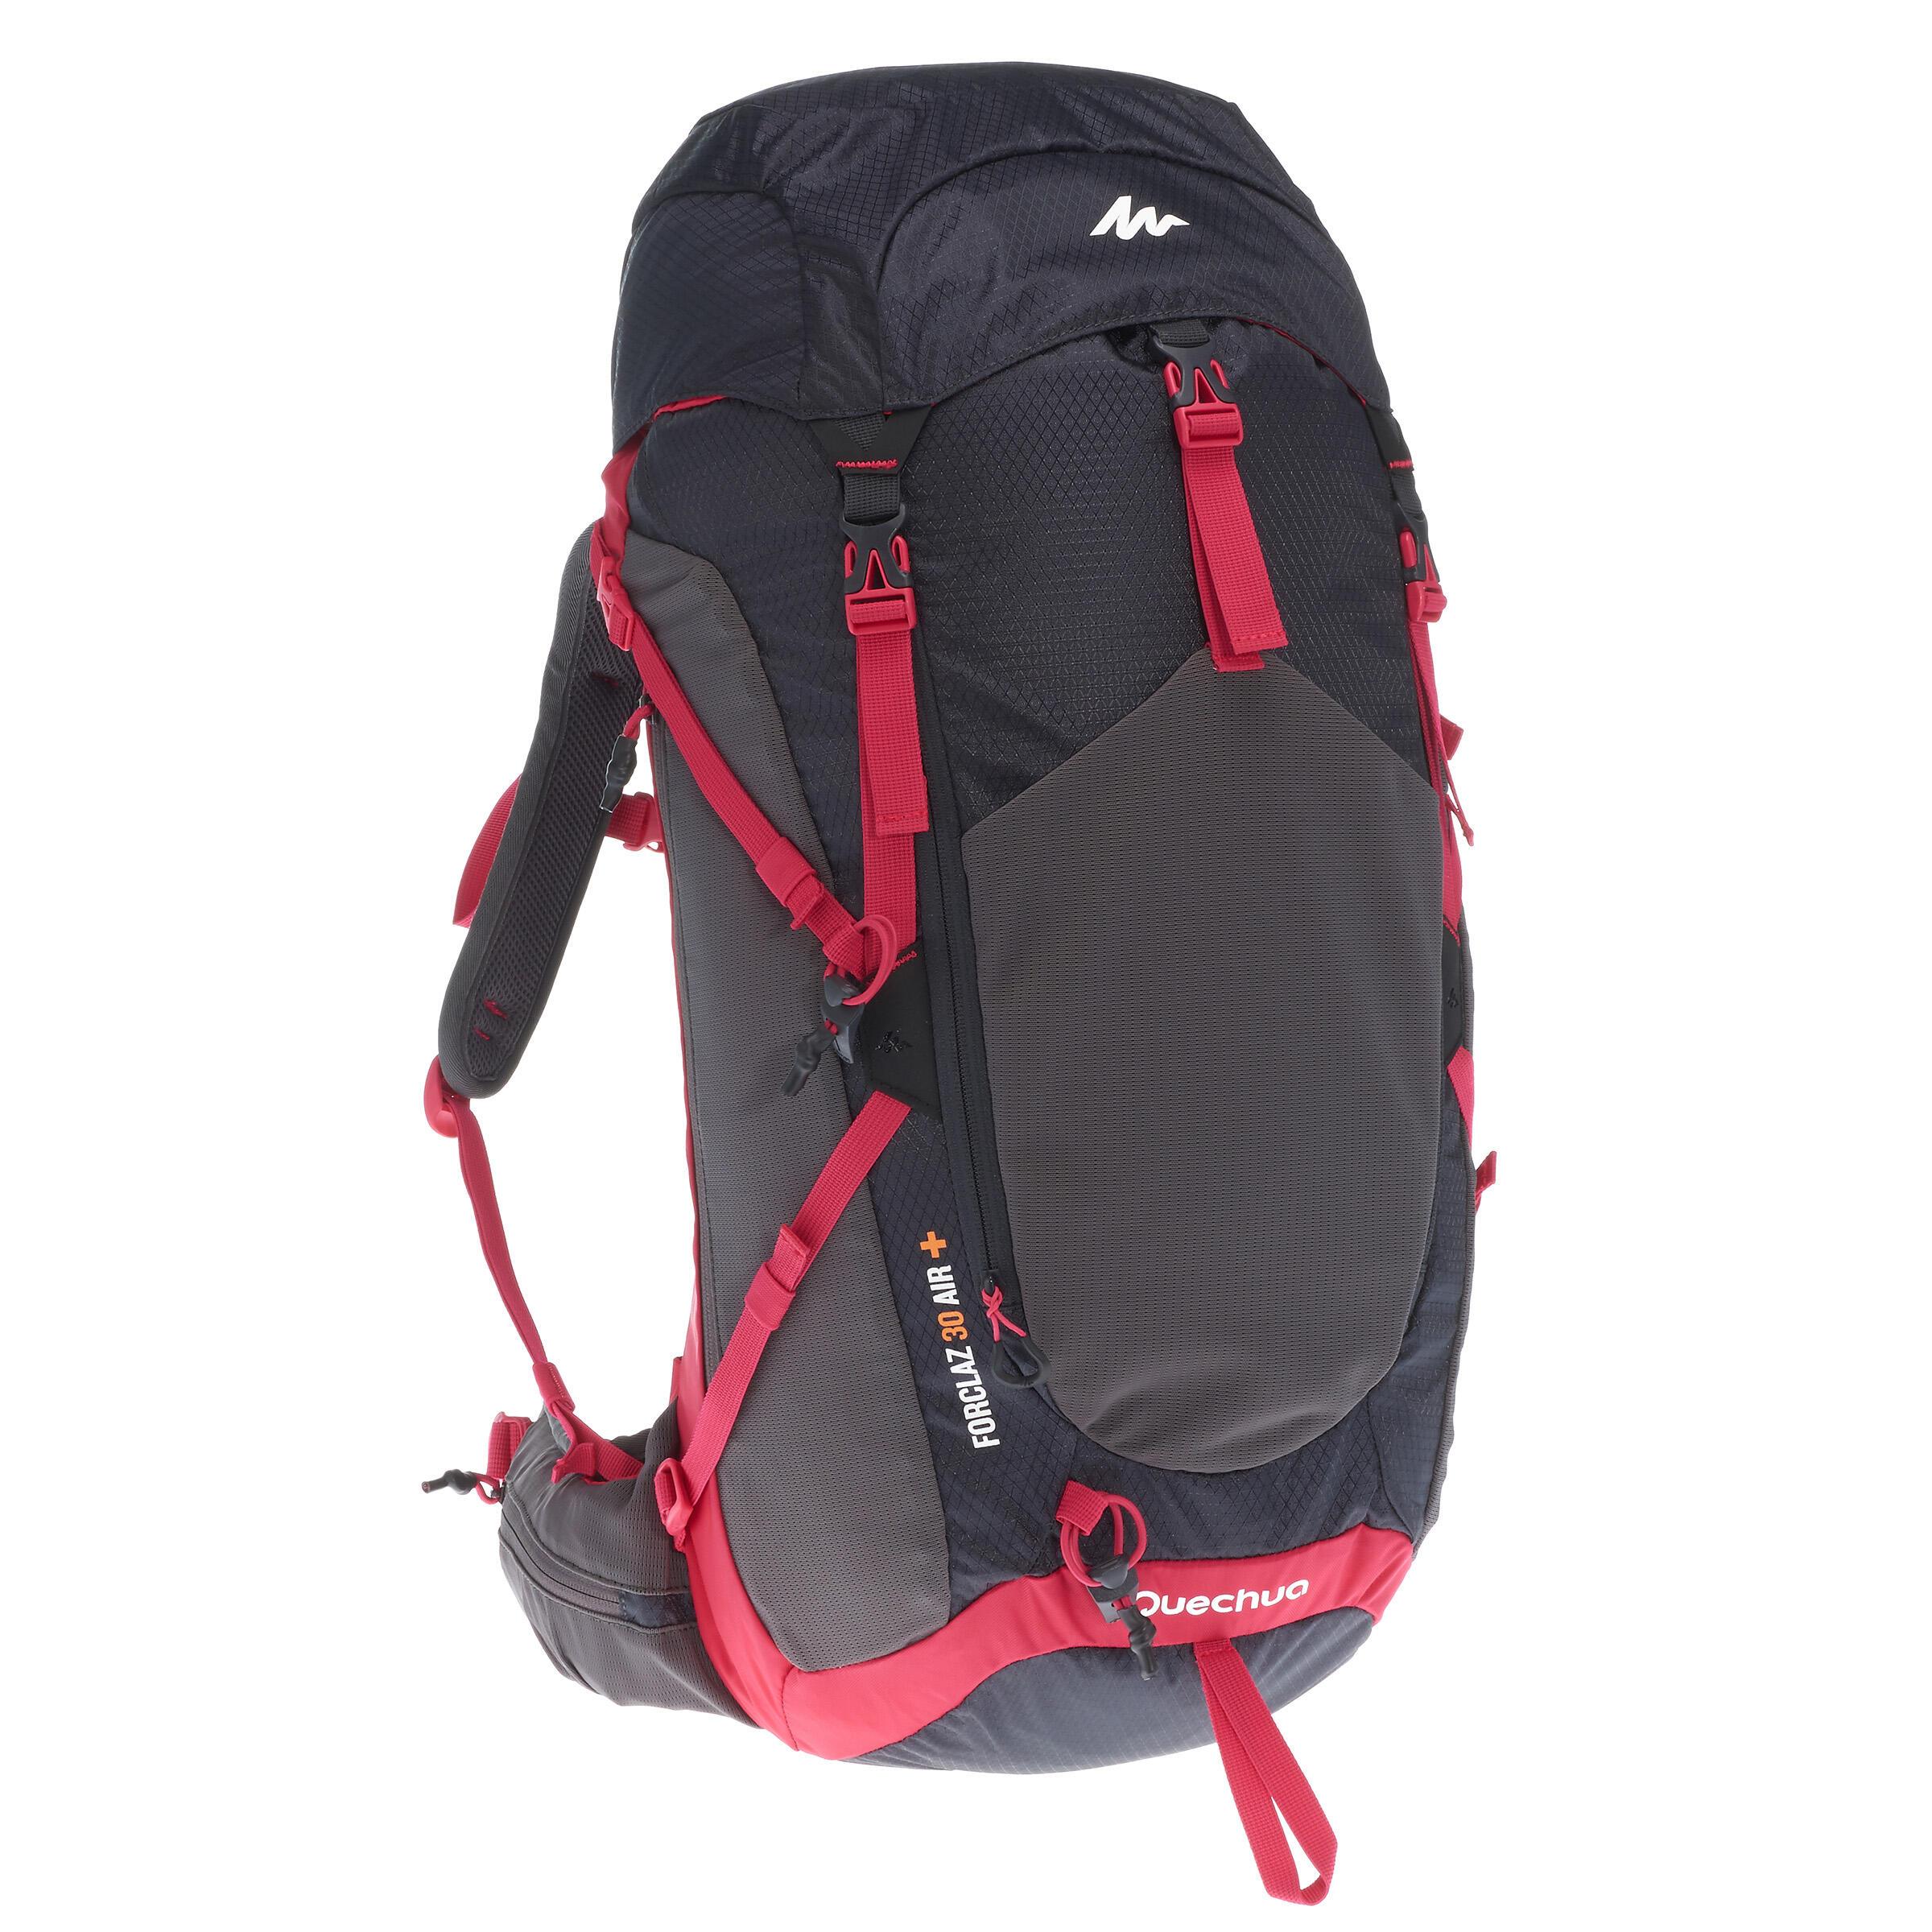 Wanderrucksack Bergwandern MH500 30 Liter Damen schwarz/rosa